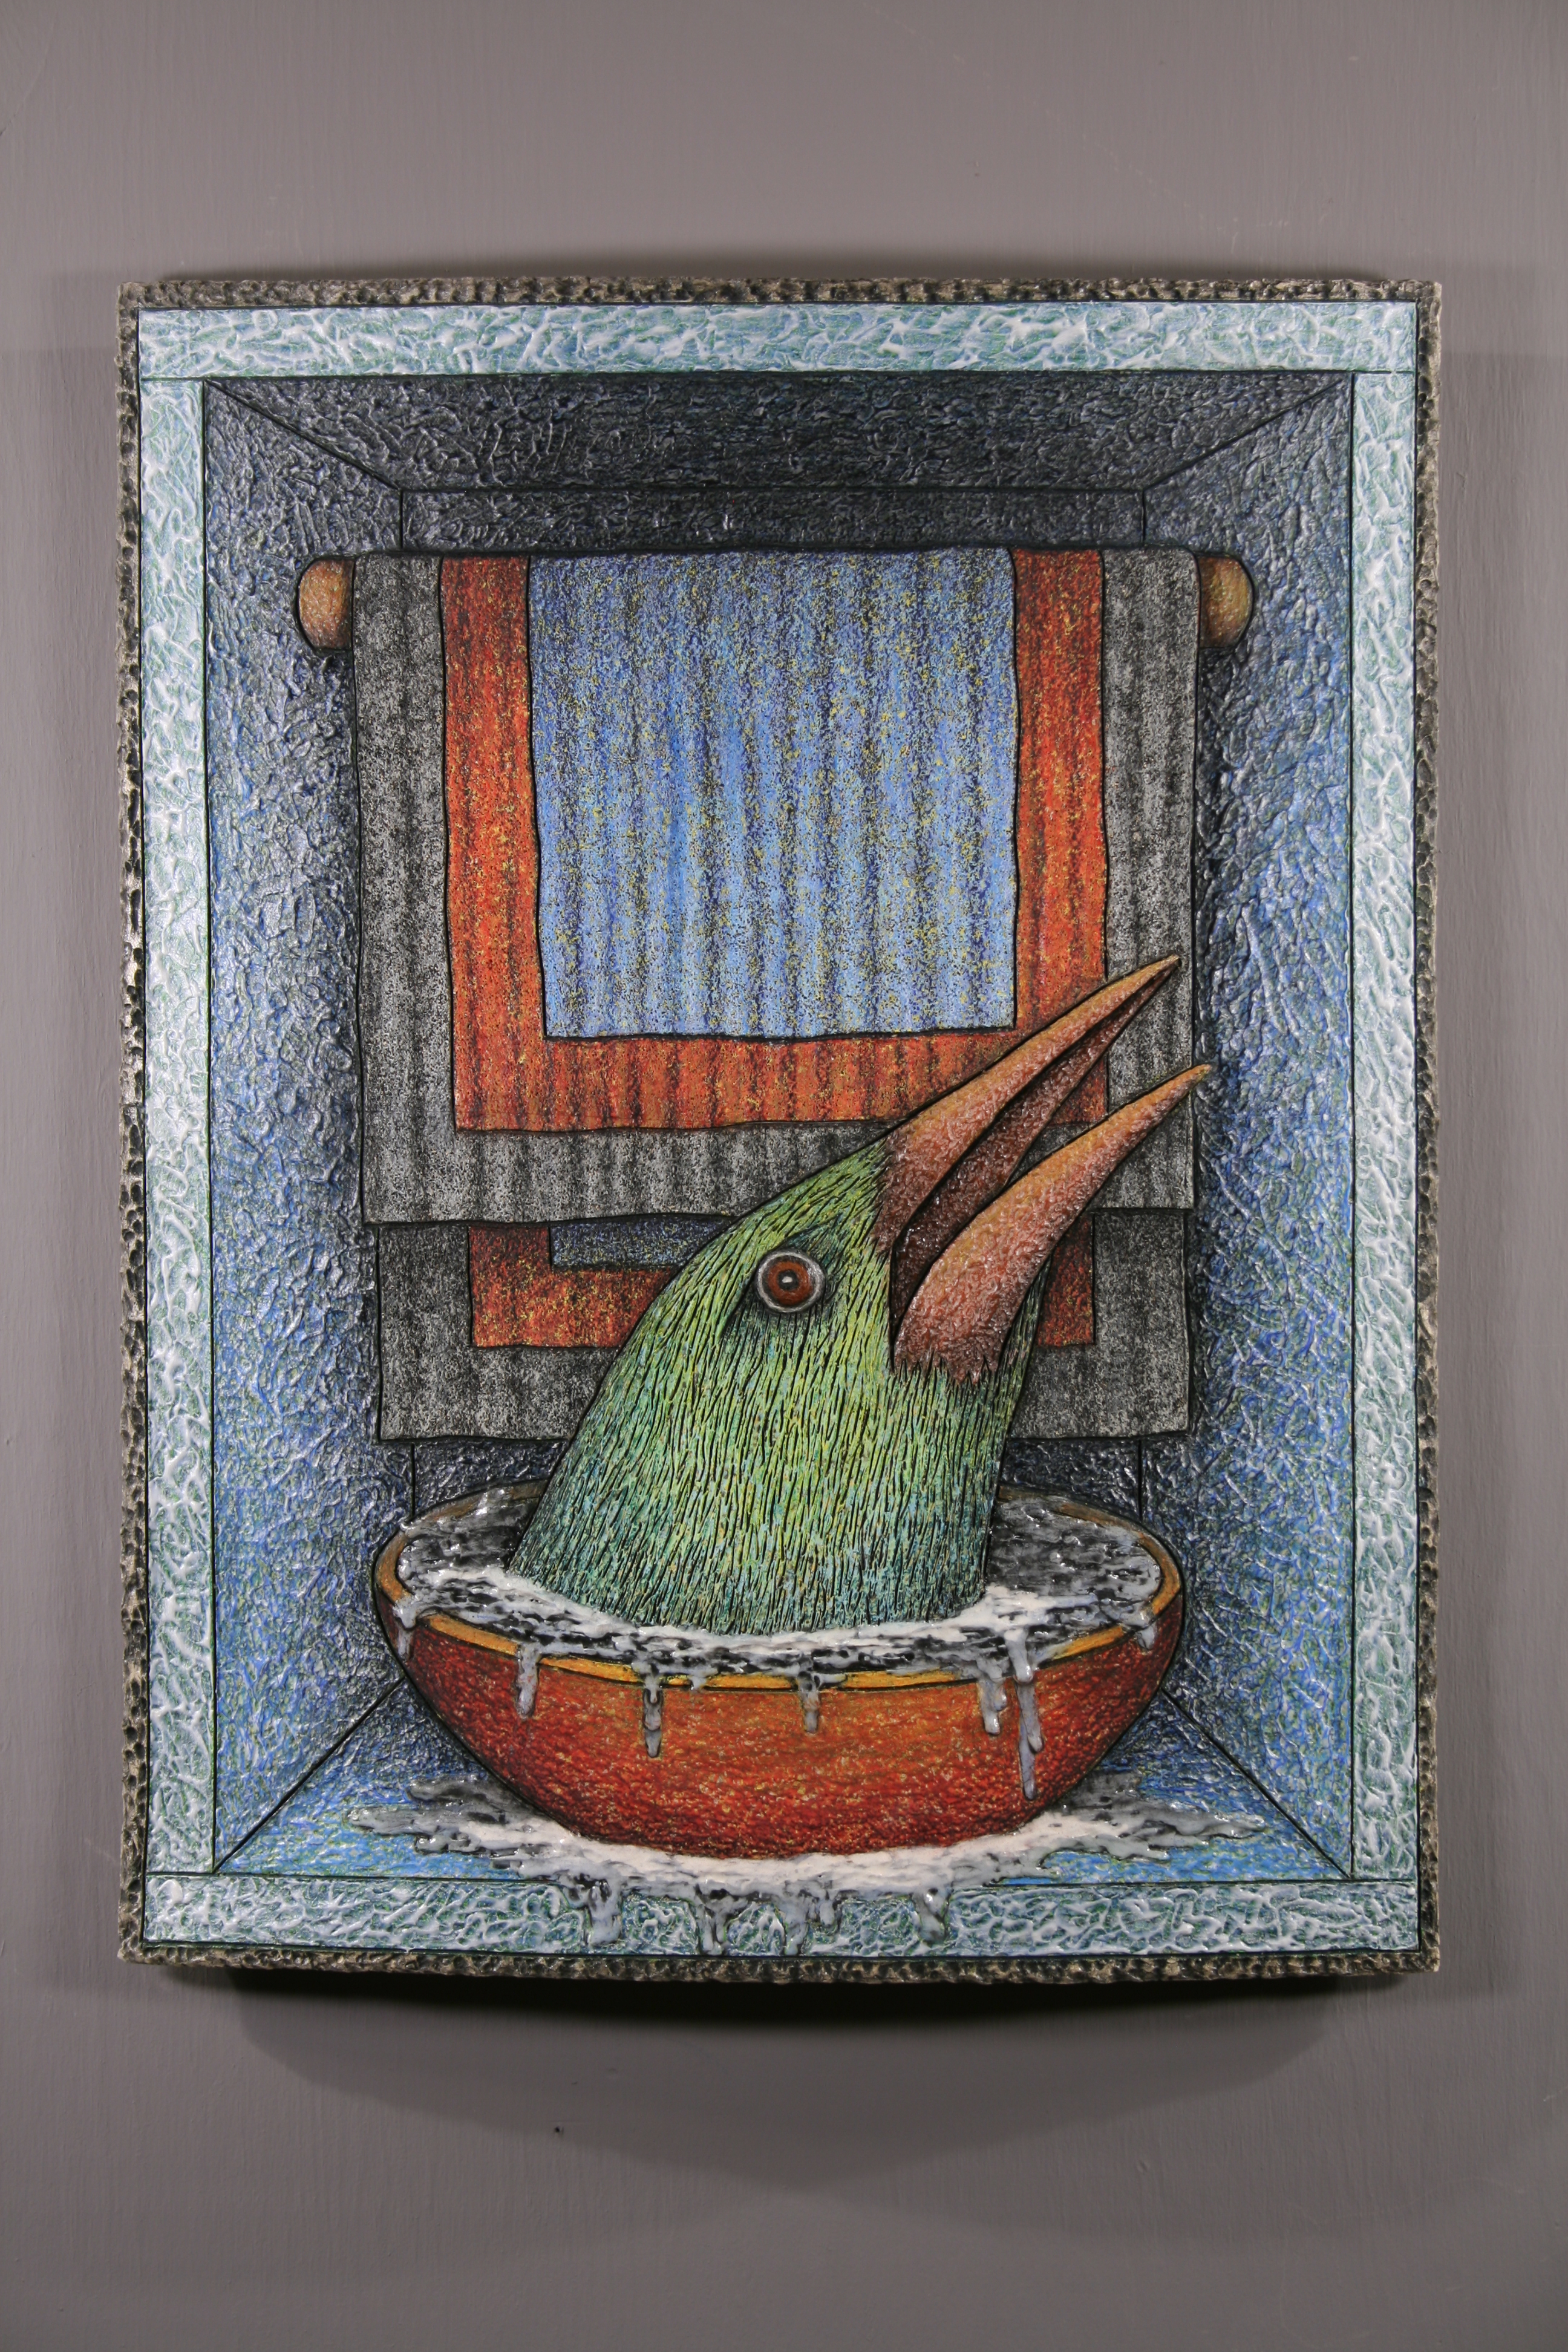 "Louis Marak - Avian Bath House - 2017 - Wall piece - 22.5"" x 17.5"" x 2"""